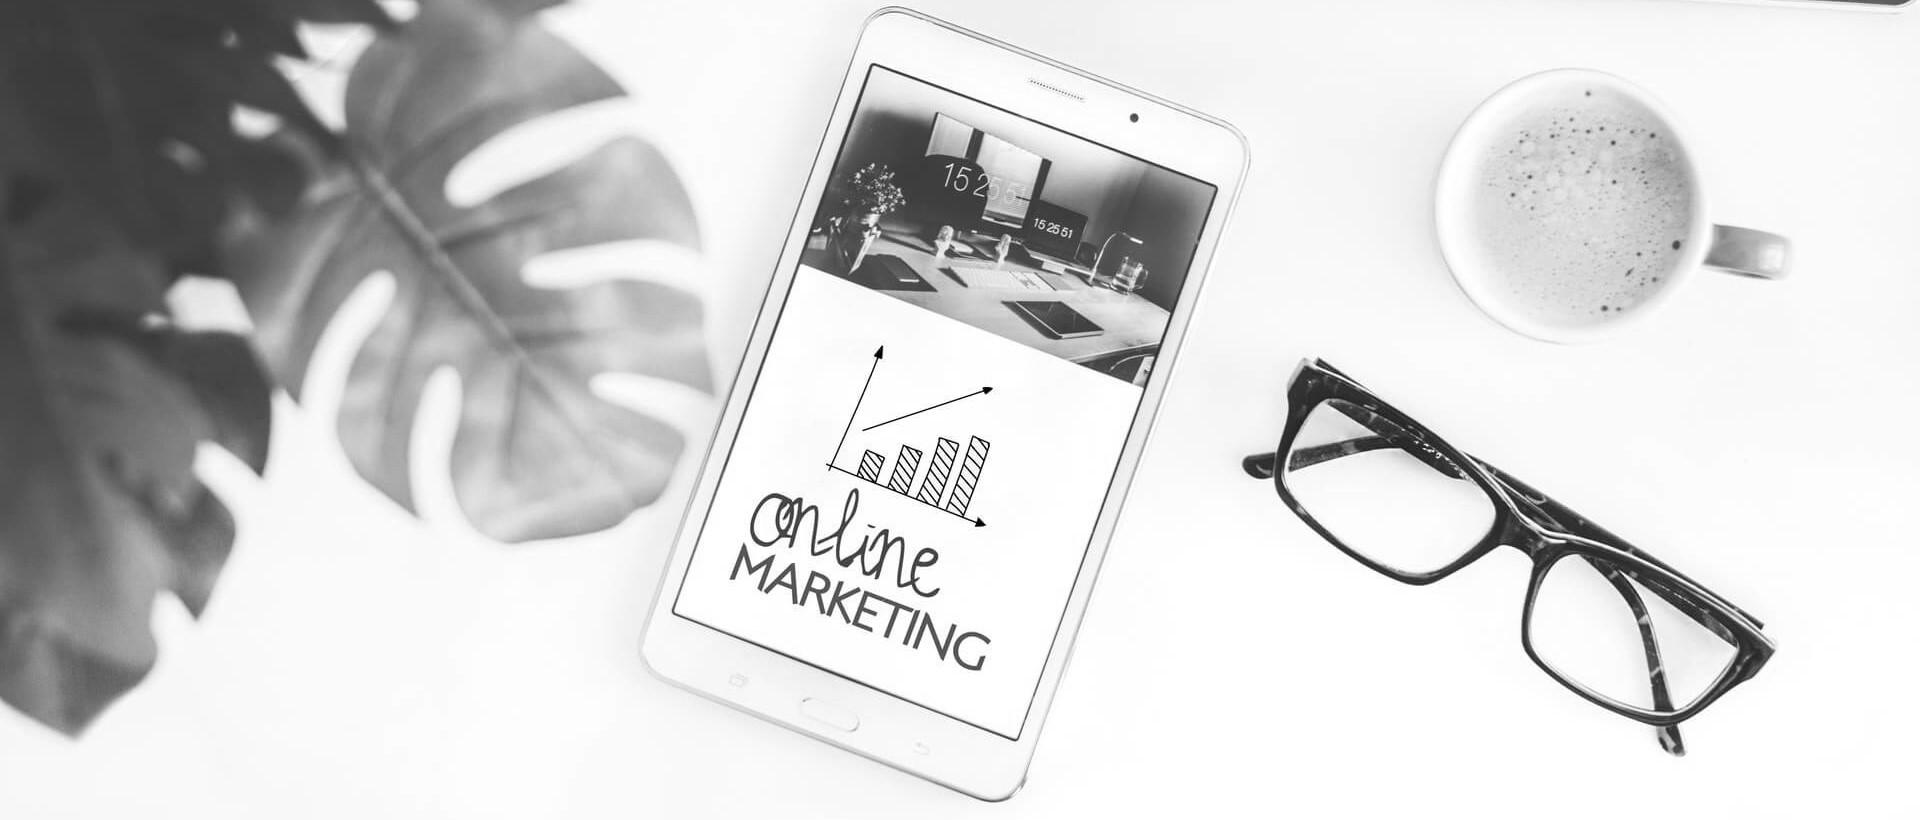 Email Marketing-Online marketing